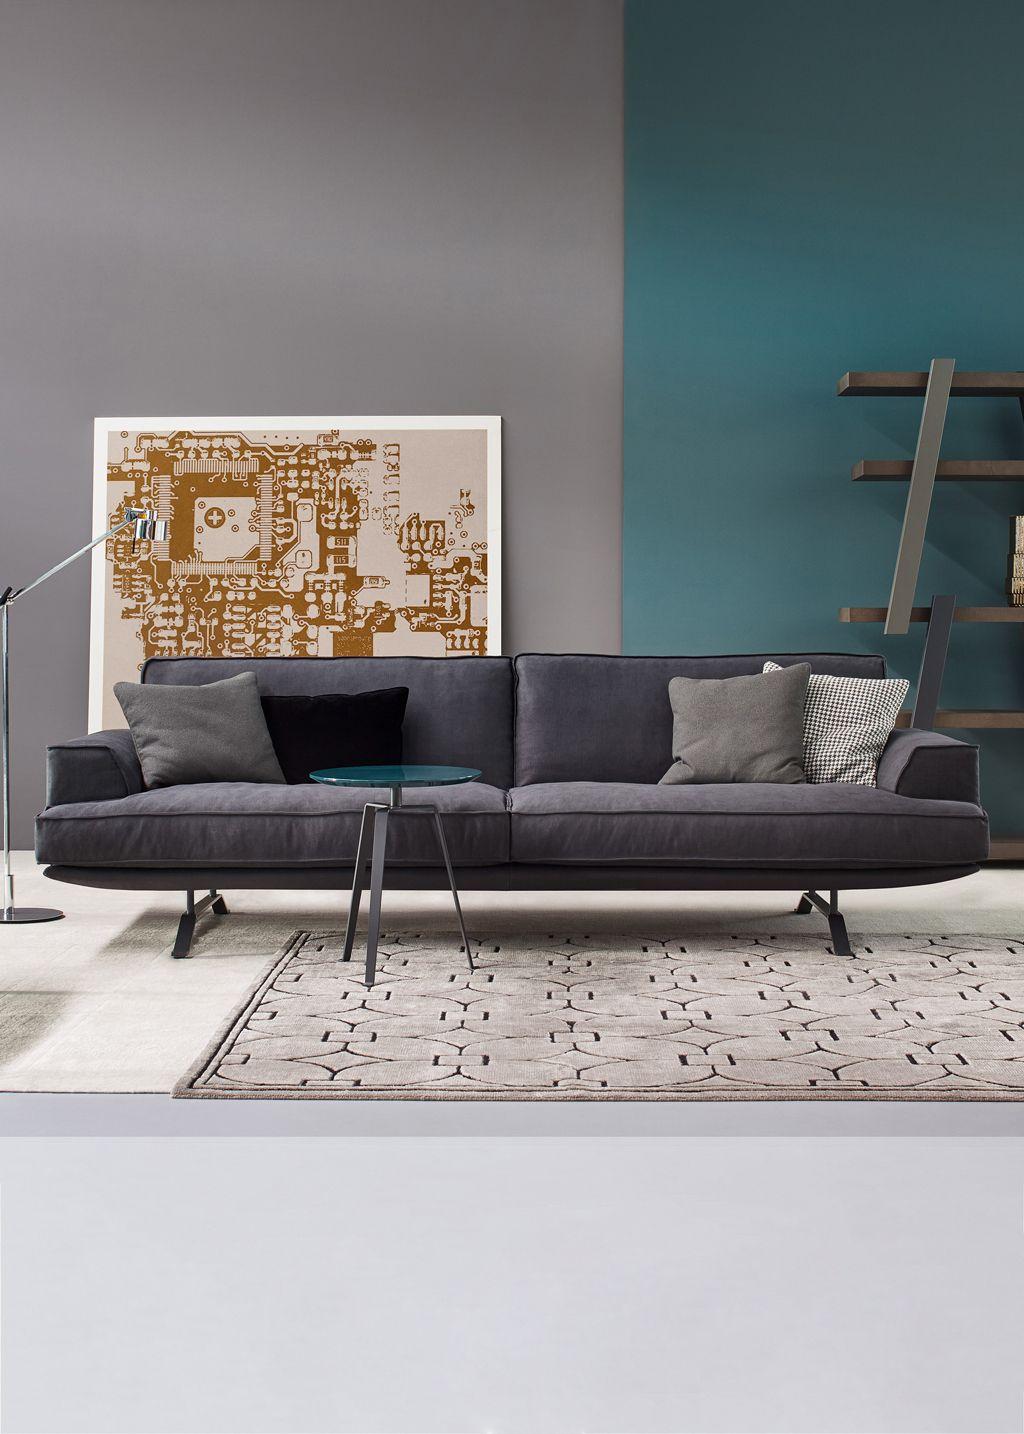 Slab Plus Design Depot Furniture Furniture Miami Showroom Furniture Sofa Set Sofa Design